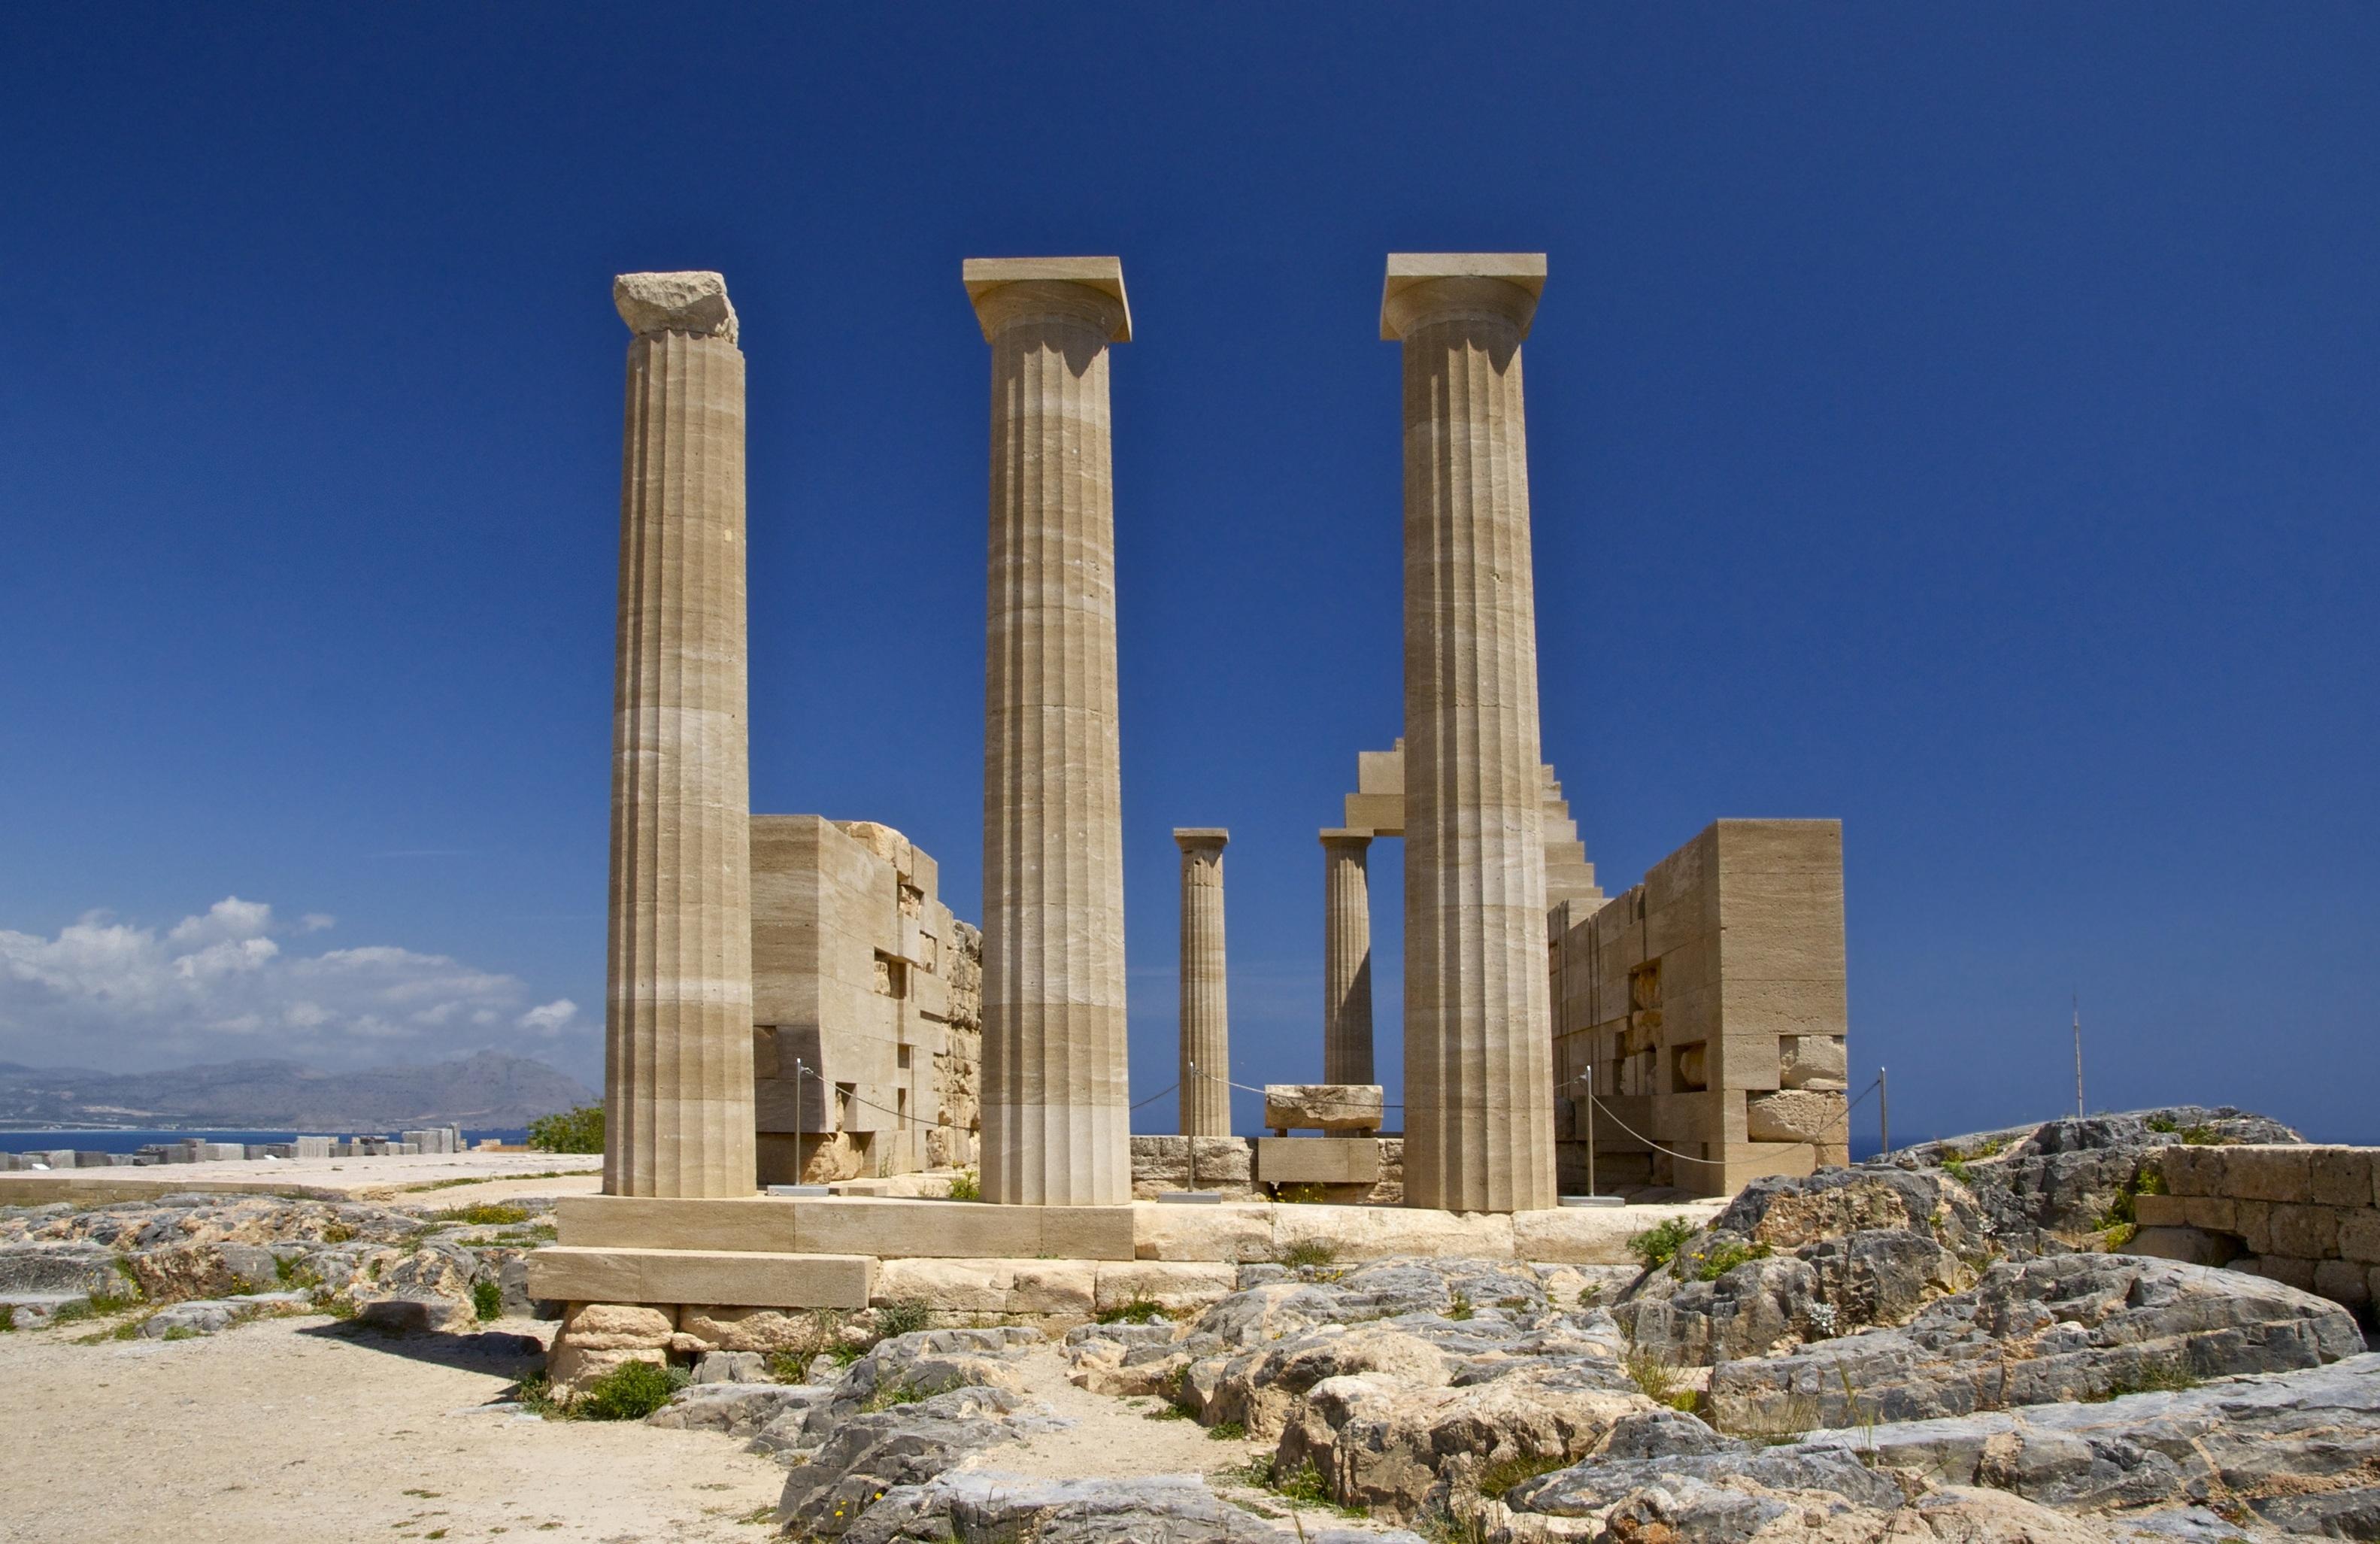 Free Images column tower island landmark historic tourism